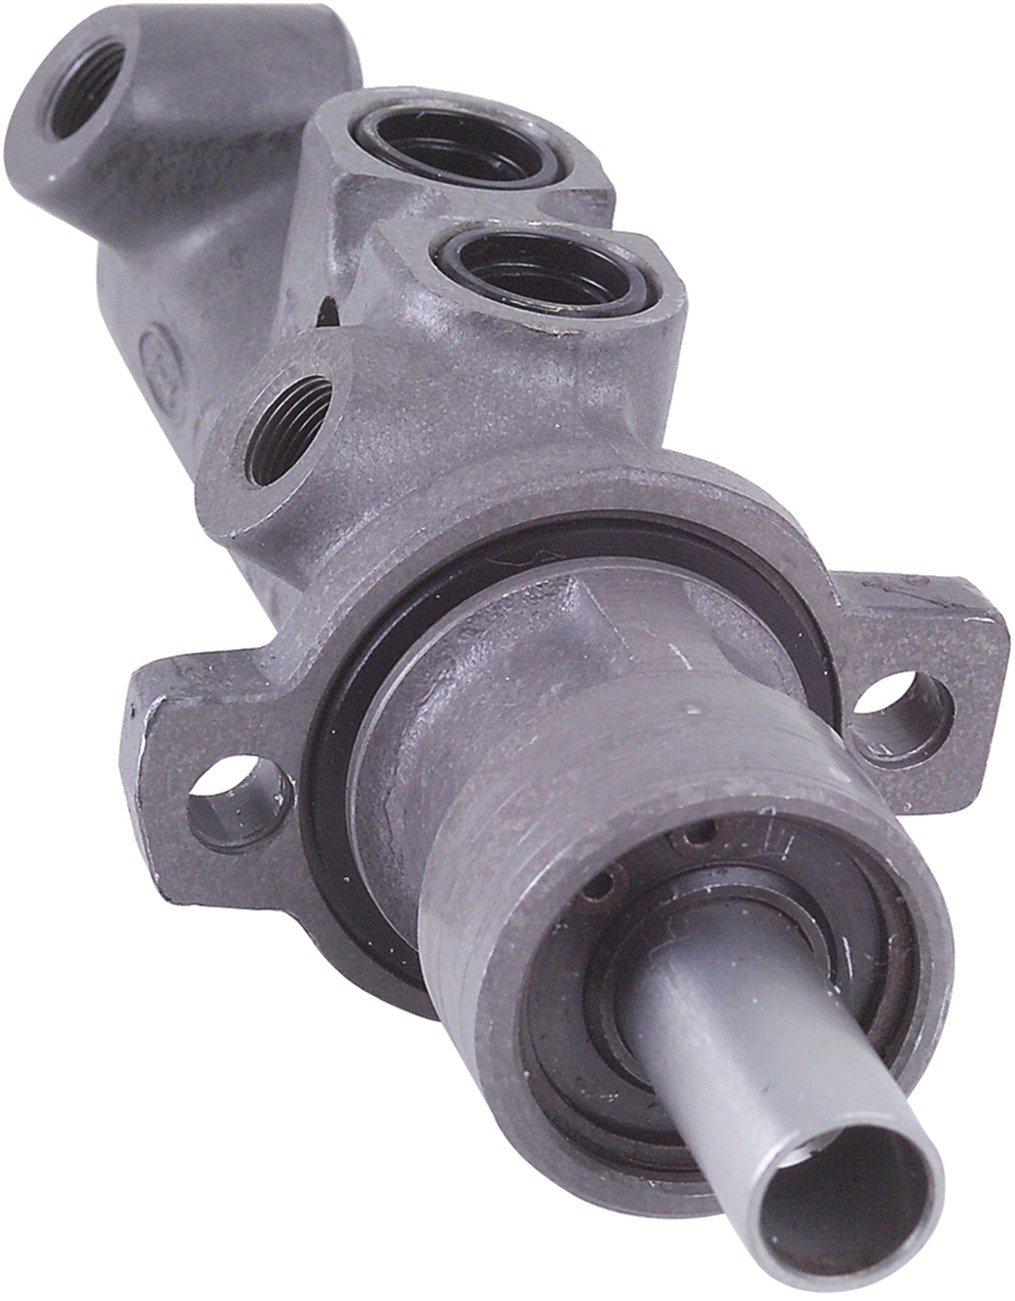 Cardone 10-2890 Remanufactured Master Cylinder A1 Cardone